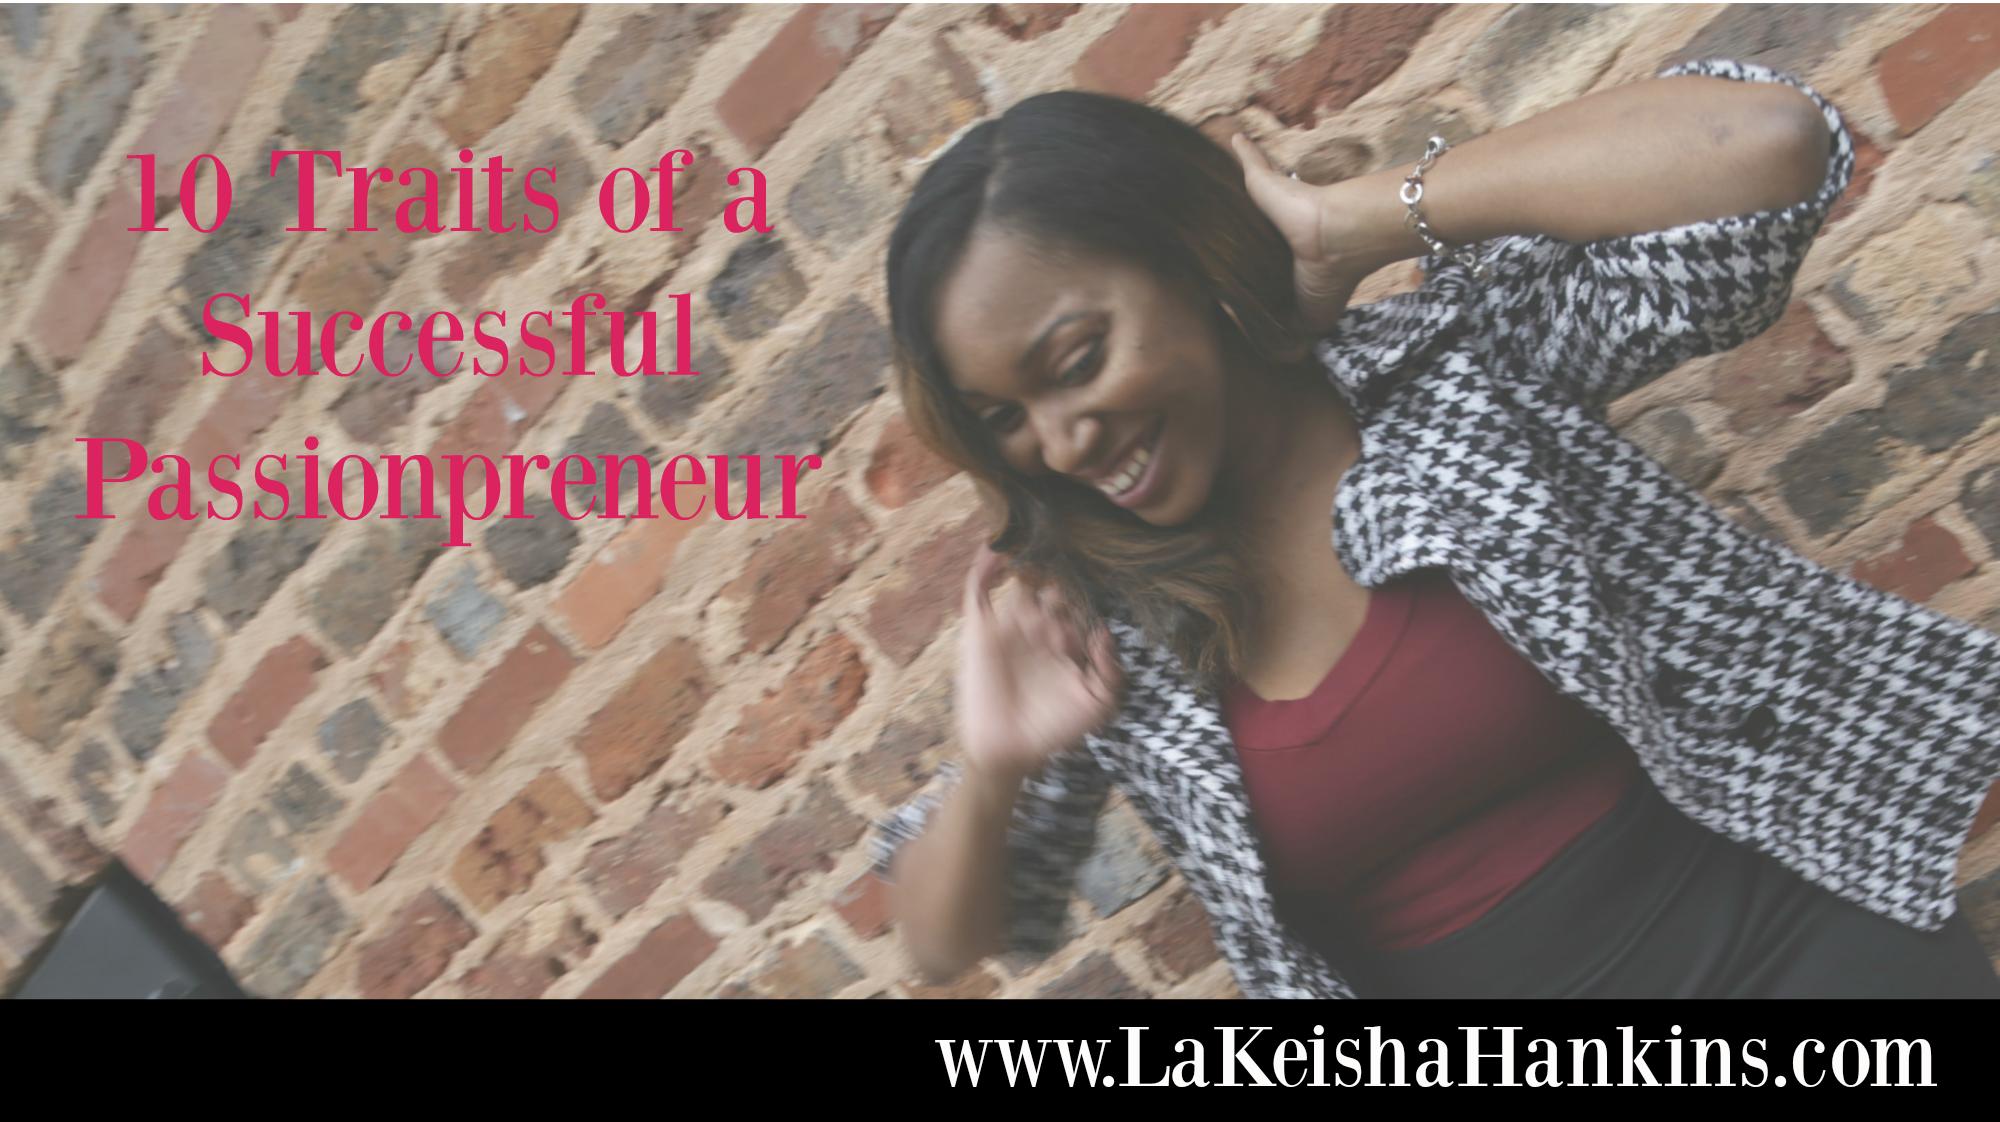 10 Traits of a Successful Passionpreneur